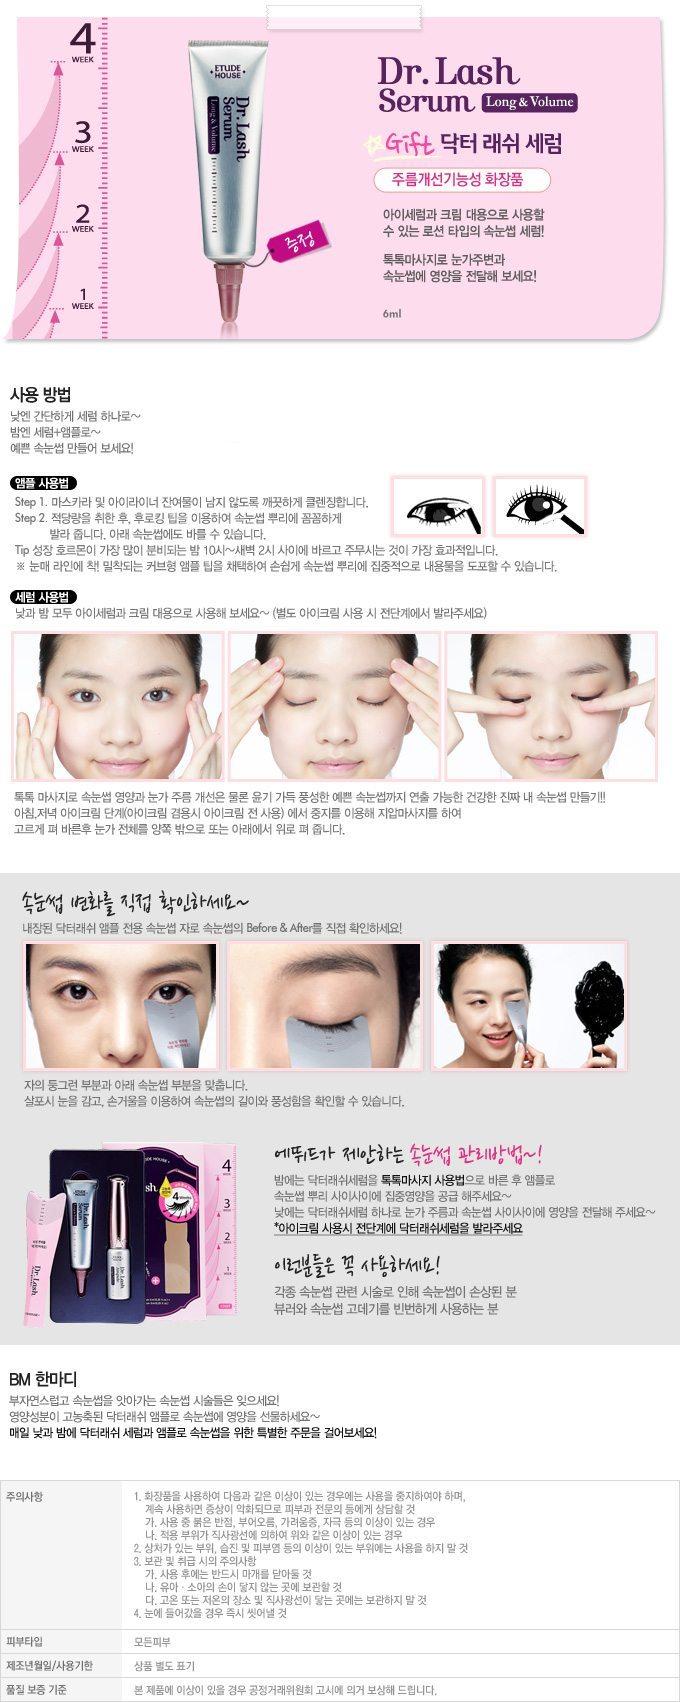 ea5ea2b78d6 ... Etude House Dr. Lash Ampule Long and Volume 6ml + 6 ml malaysia  cleansing makeup